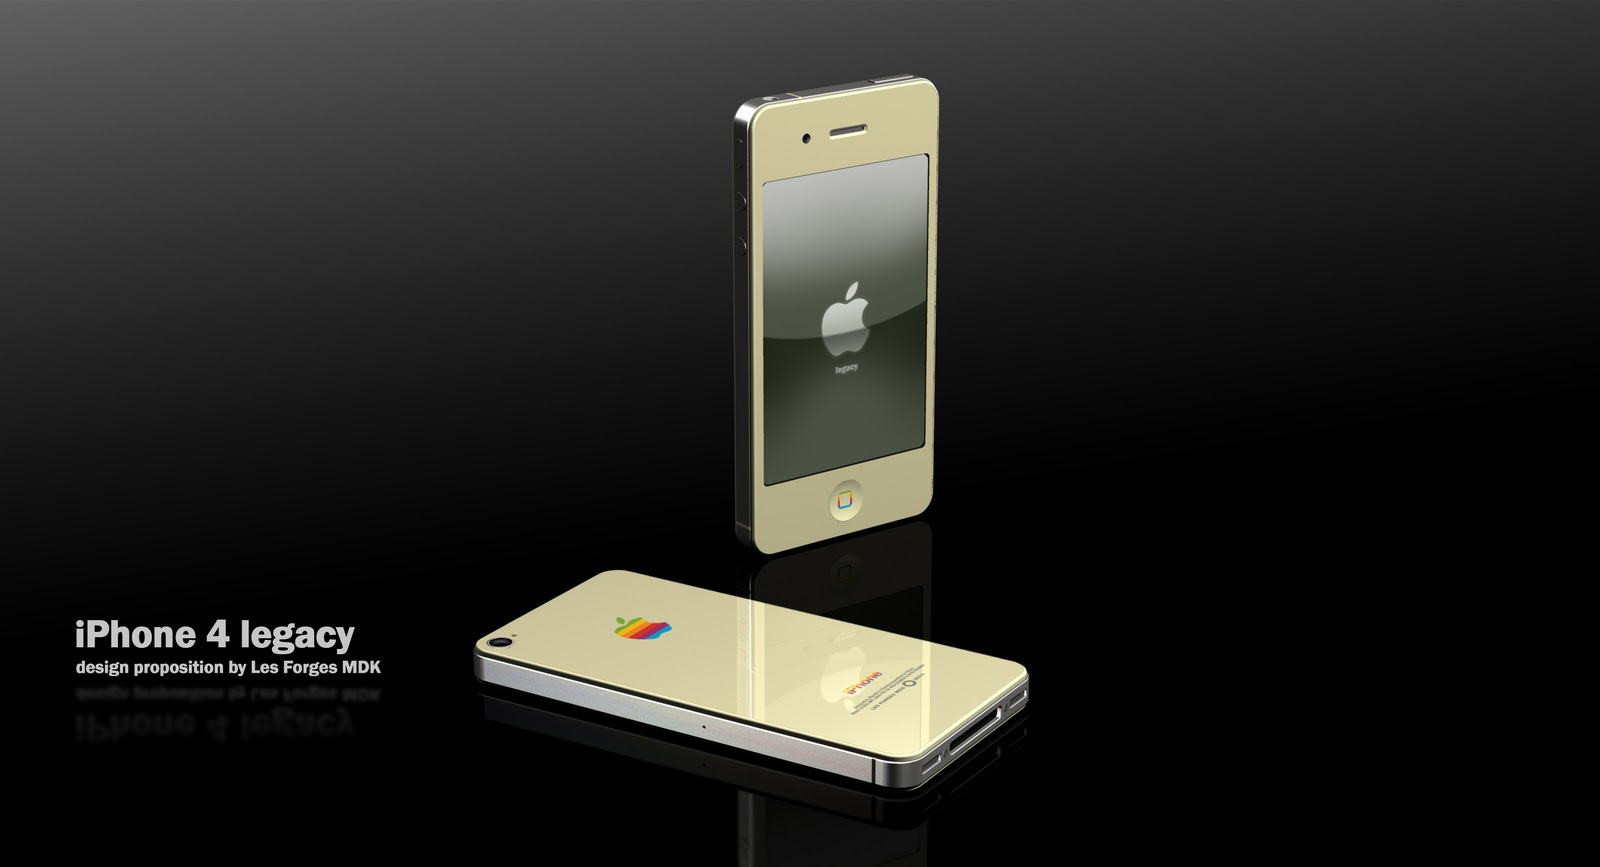 iphone 4 LEGACY MAXIME DE KEISER 02